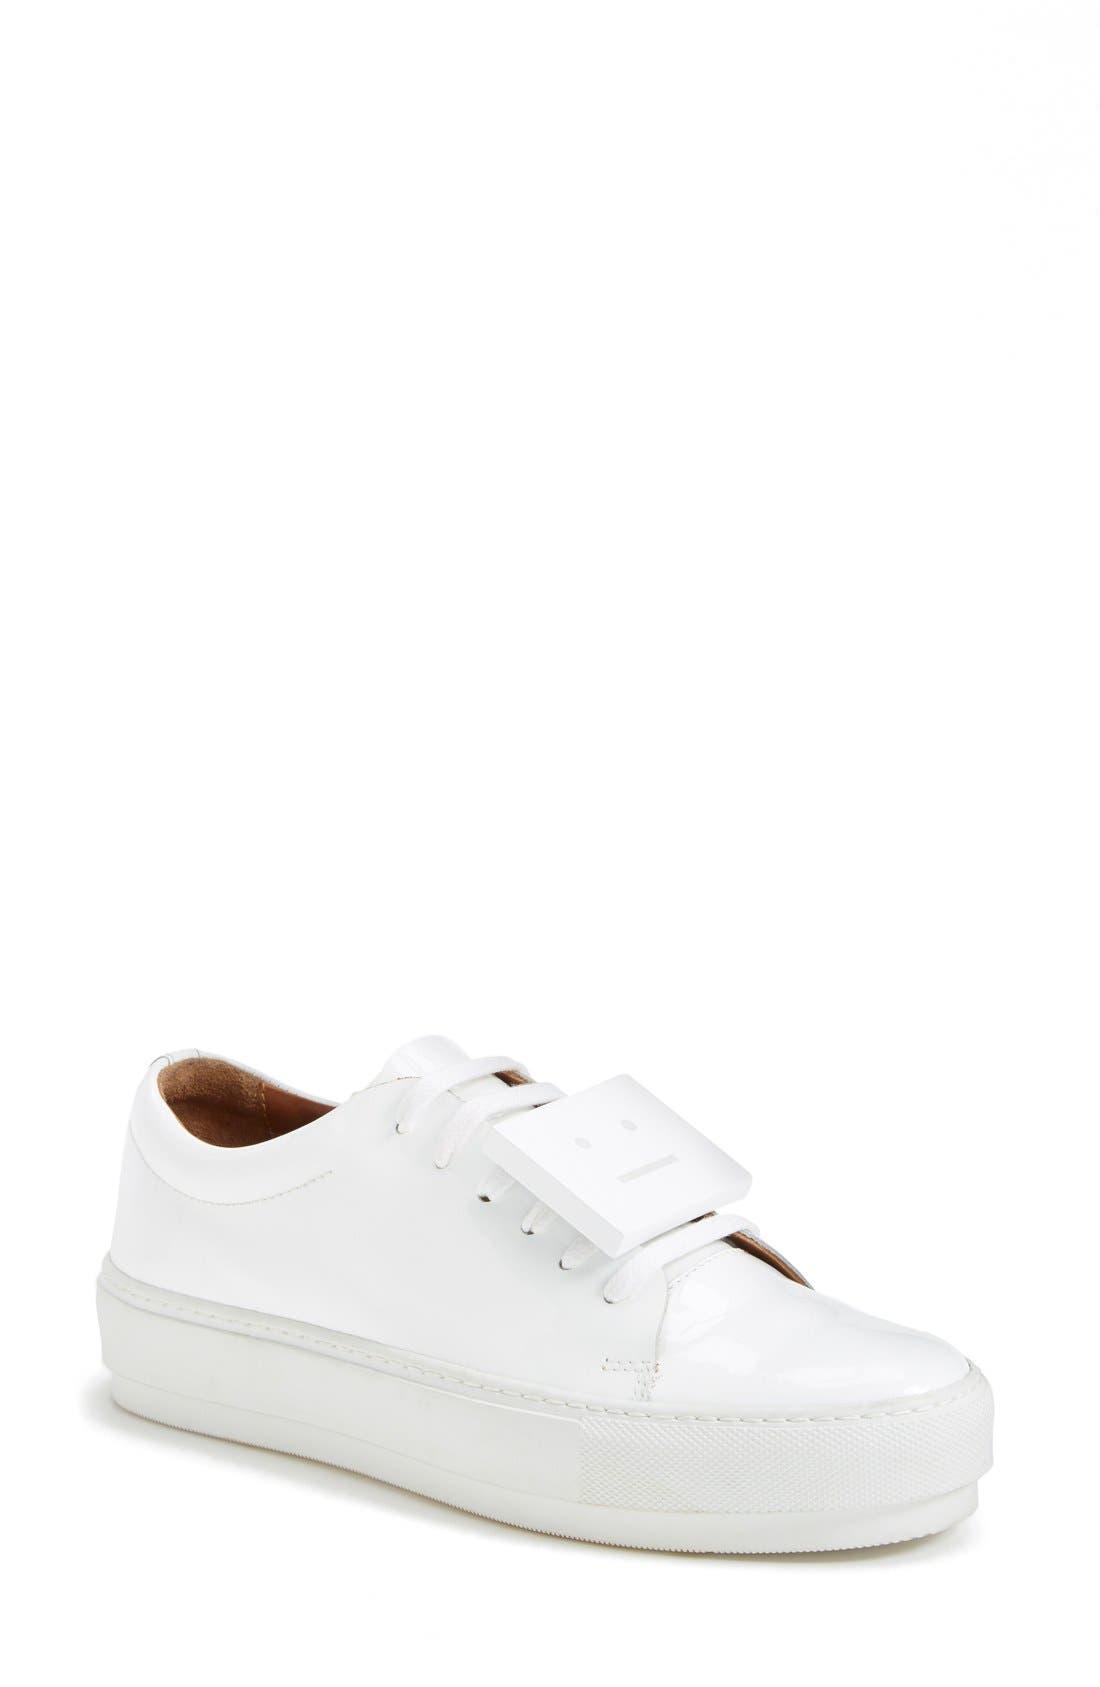 Alternate Image 1 Selected - Acne Studios Adriana Leather Sneaker (Women)